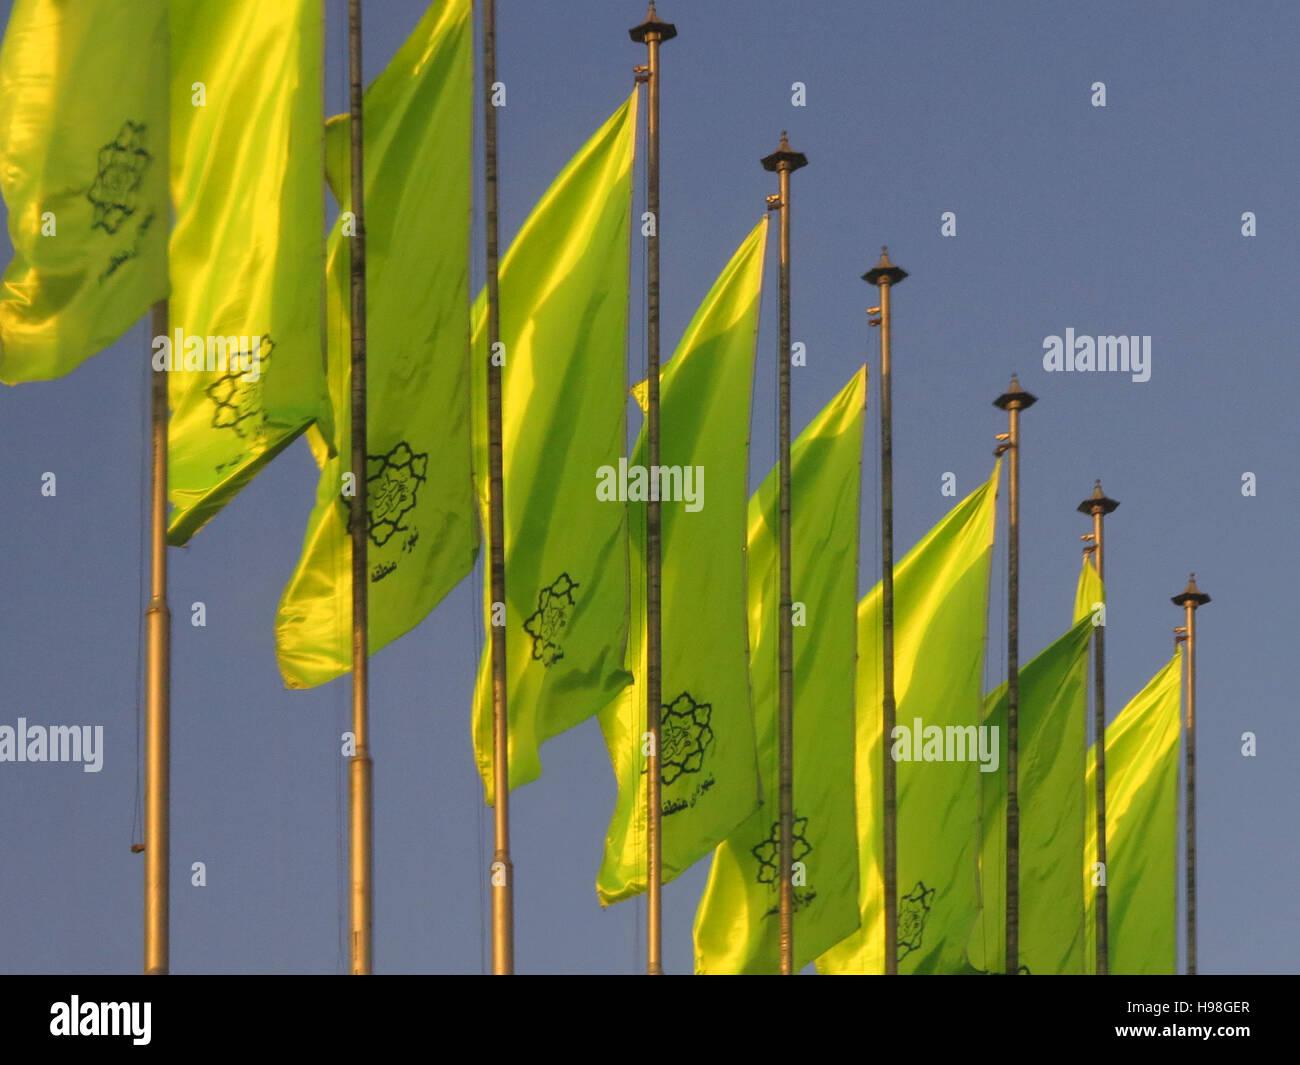 Ornamental flags in Tehran - Stock Image